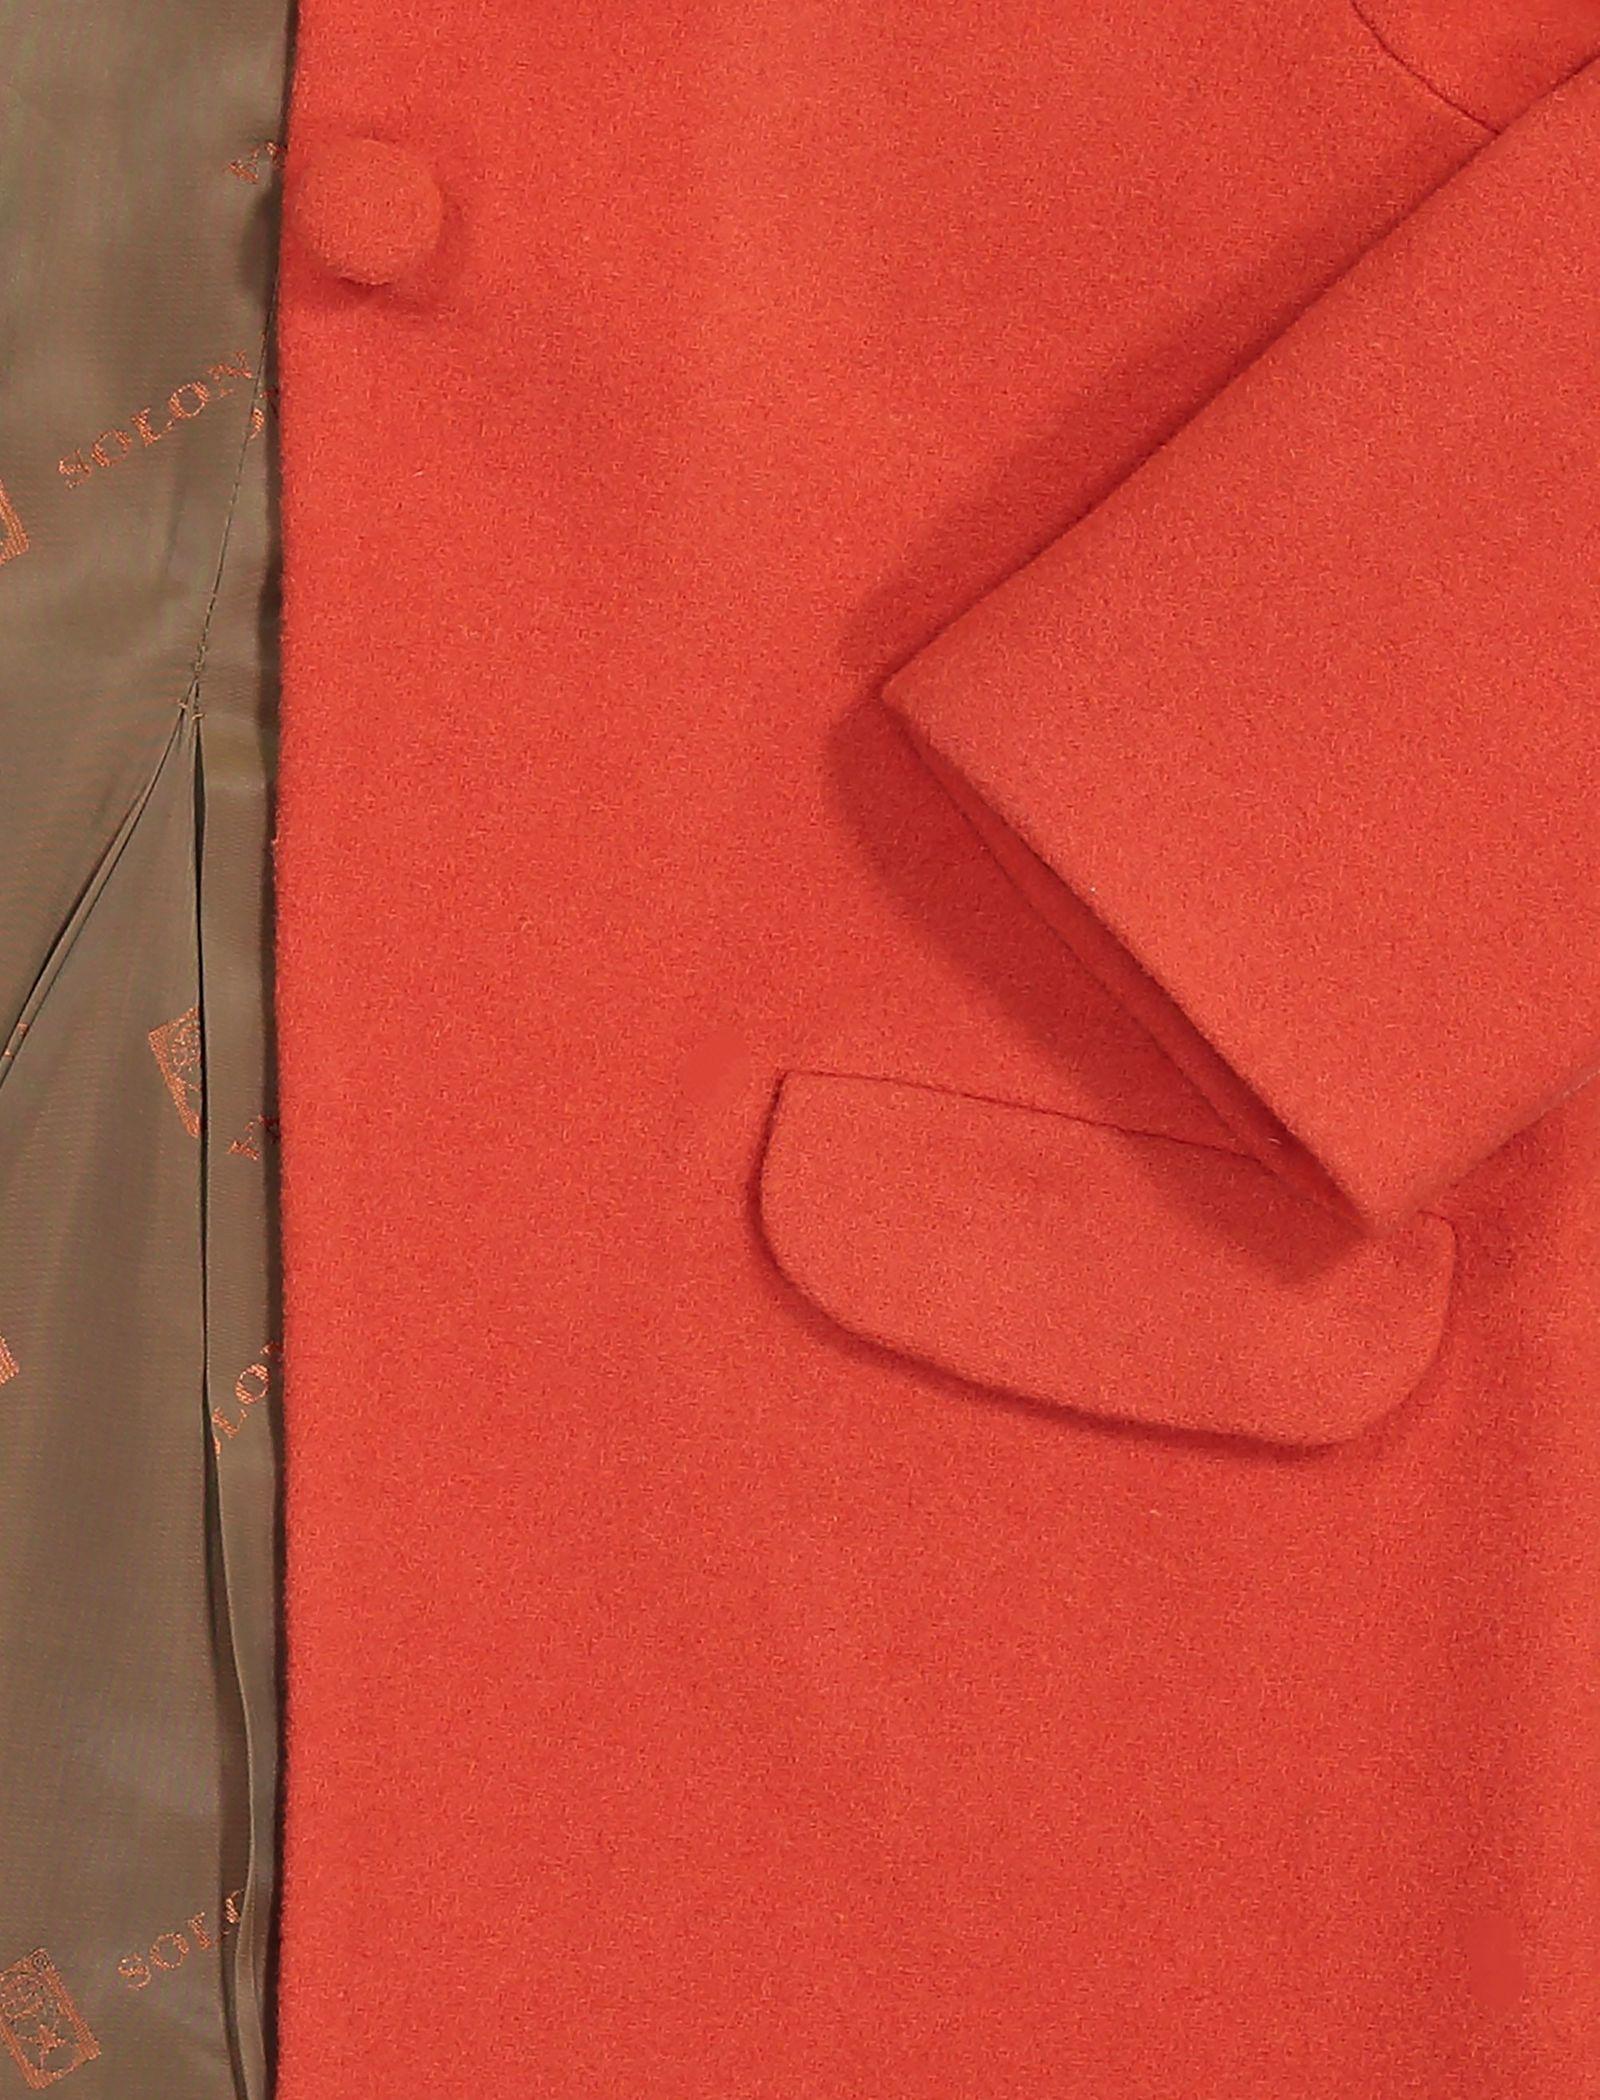 پالتو پشمی کوتاه دخترانه مدل فرانک - دایان - نارنجي - 3